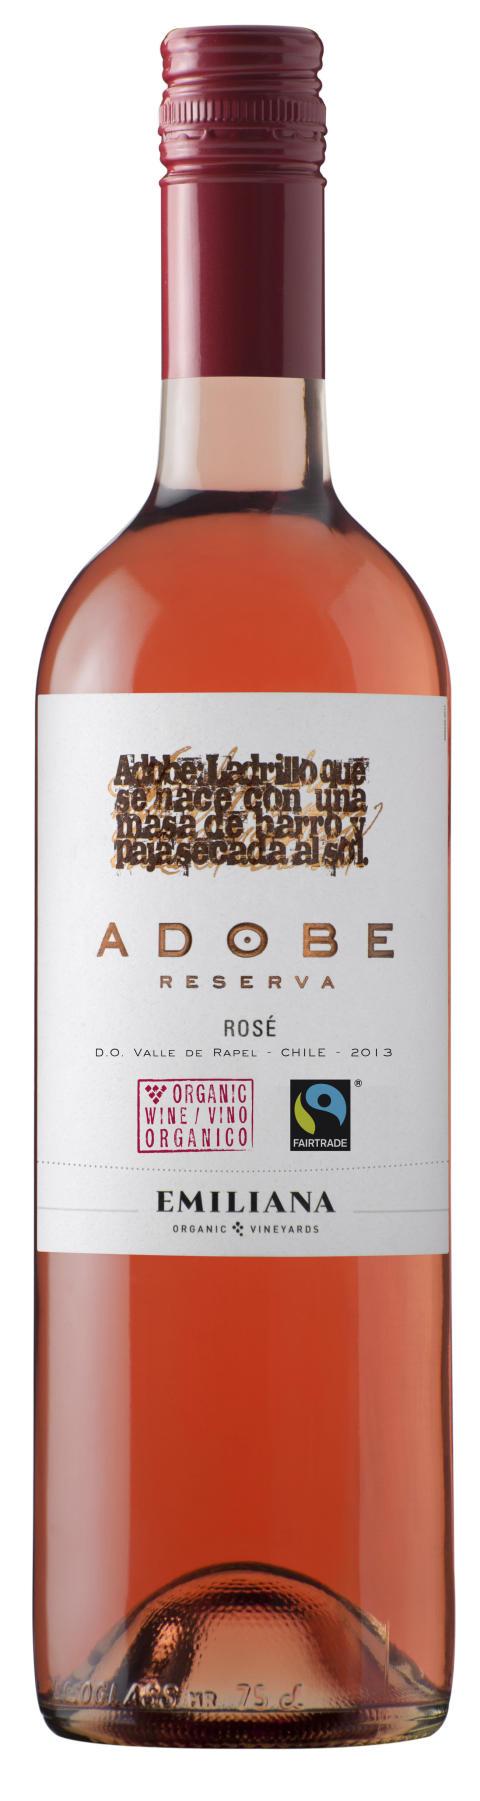 Adobe Reserva Rosé (nr 6357)